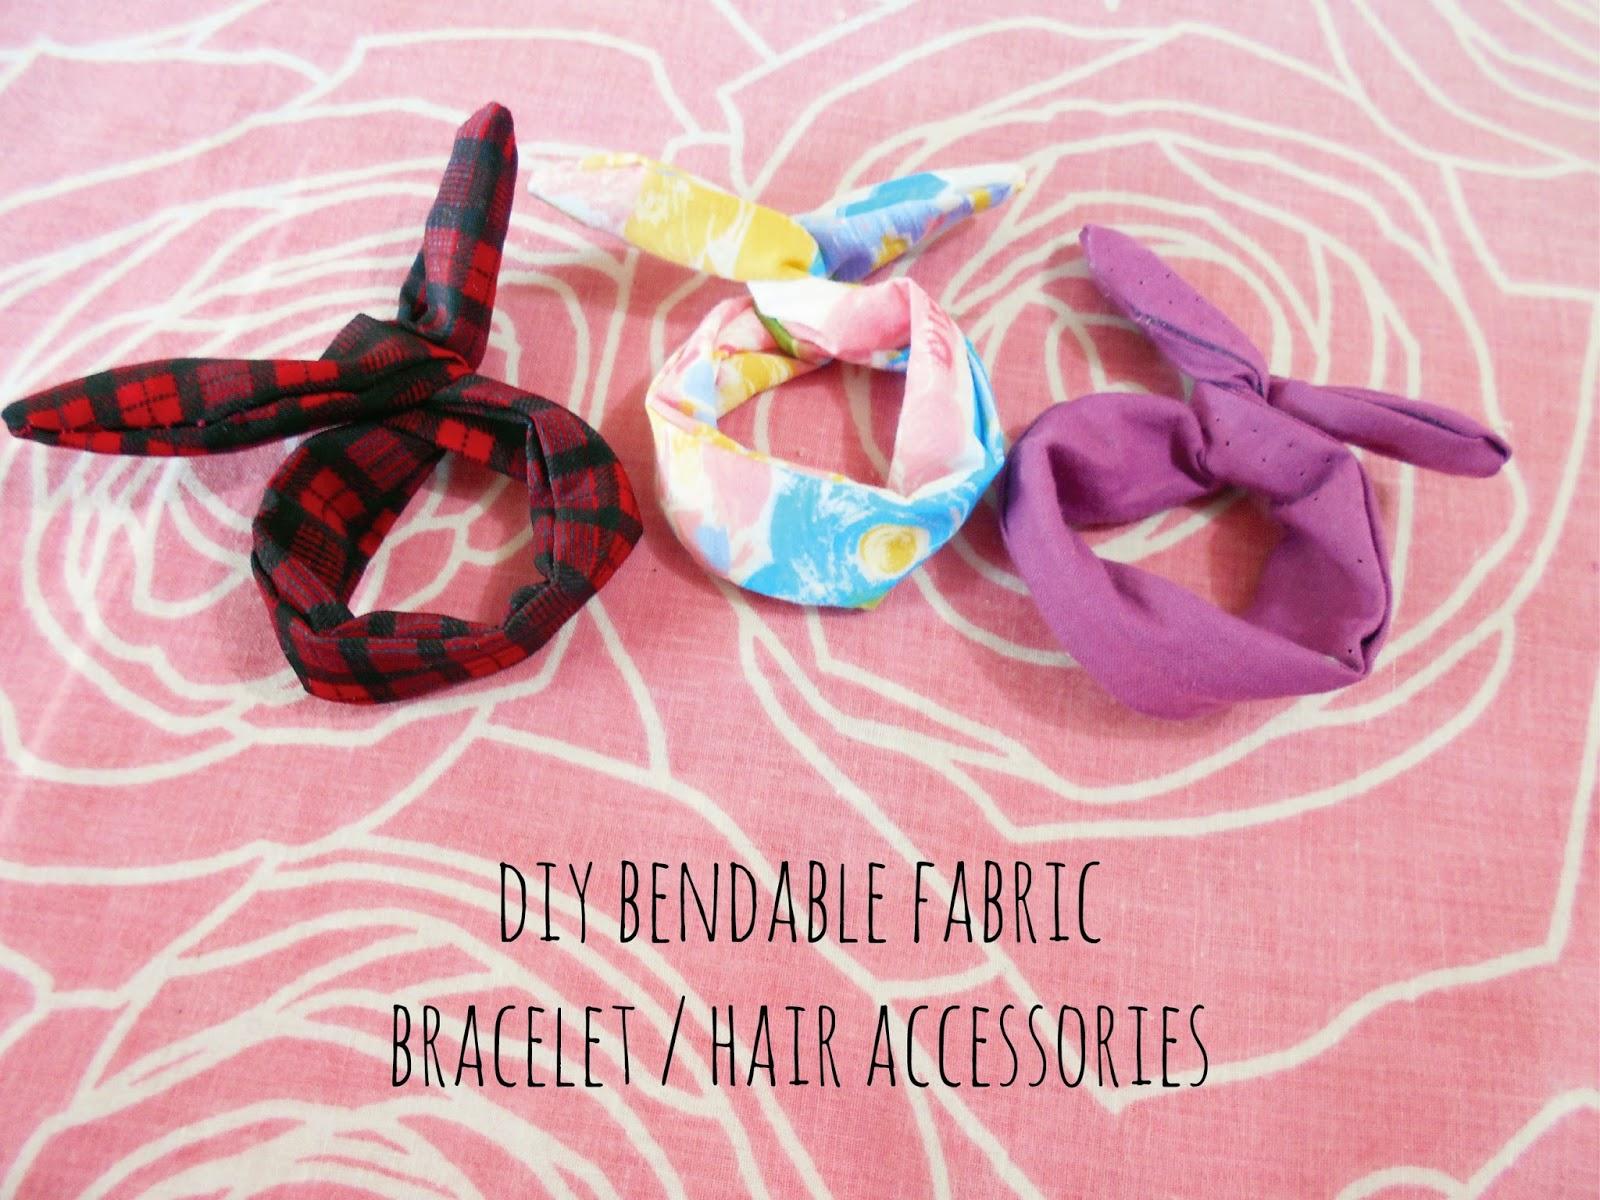 DIY - Bendable Fabric Bracelet / Hair Accessories